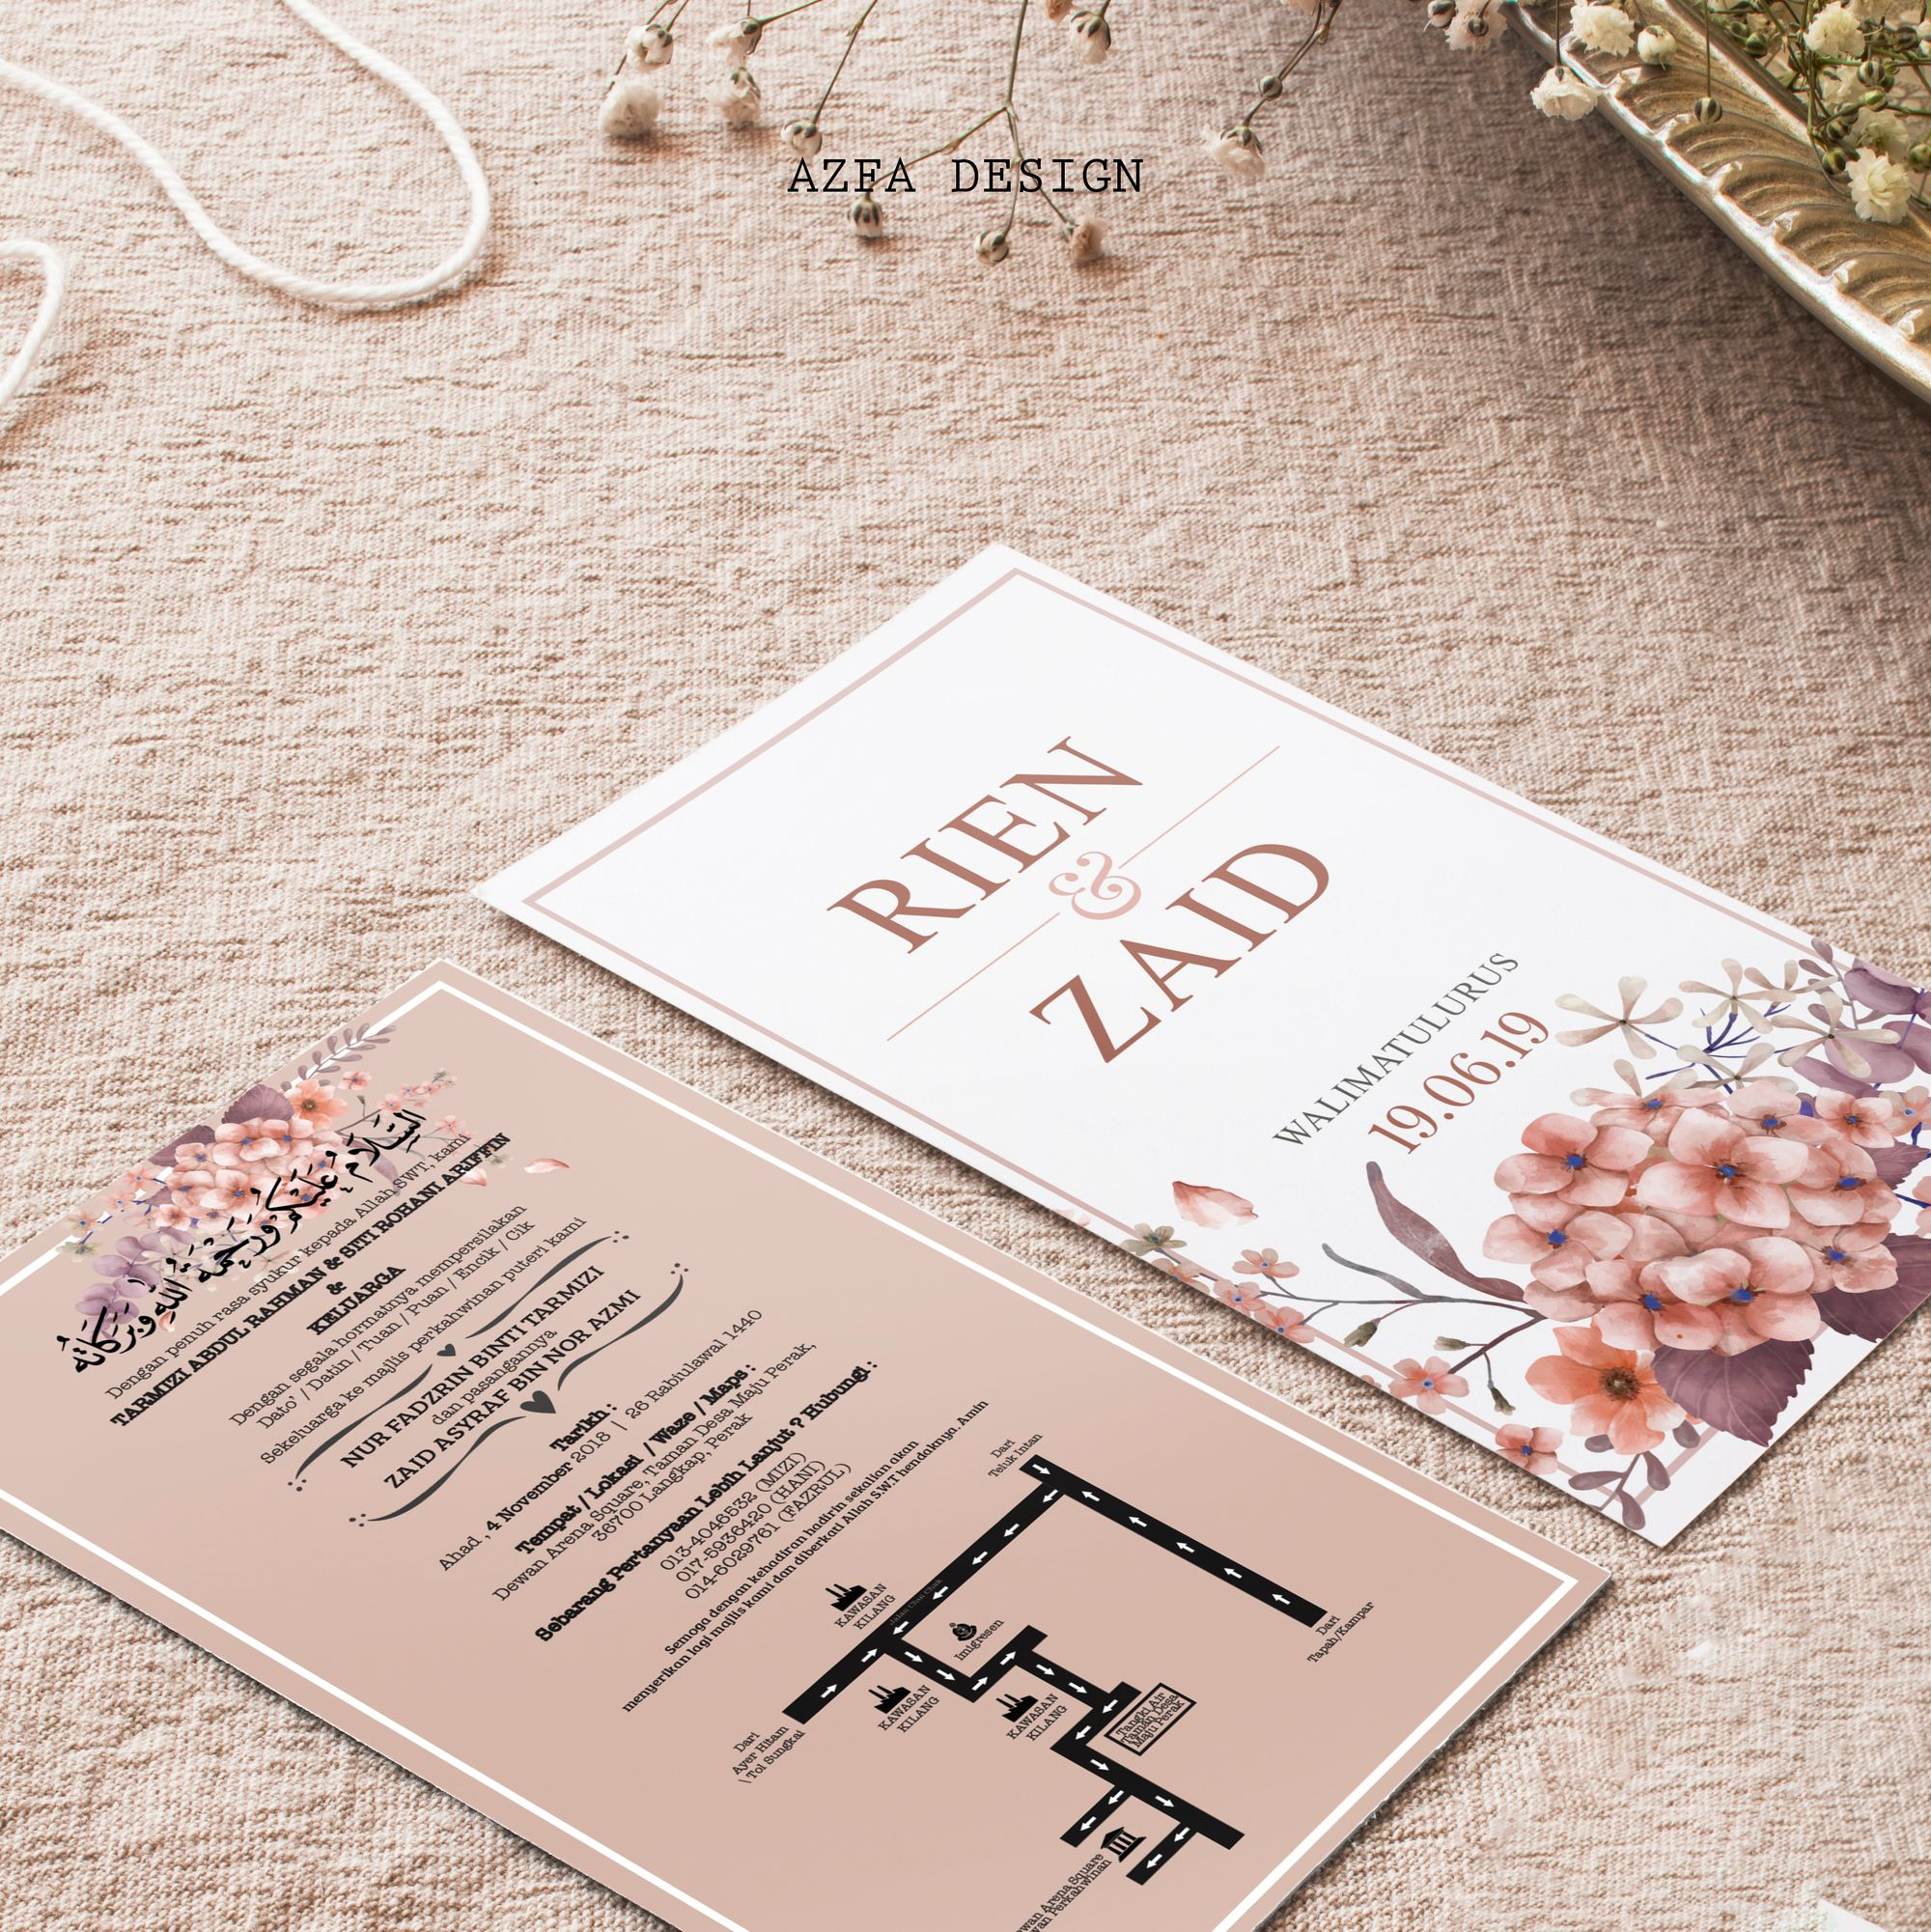 Eh Taknak Ke Kad Kahwin Korang Nampak Special Bila Sampai Ditangan Tetamu Tetamu Korang Wedding Invitation Cards Wedding Cards Wedding Background Decoration